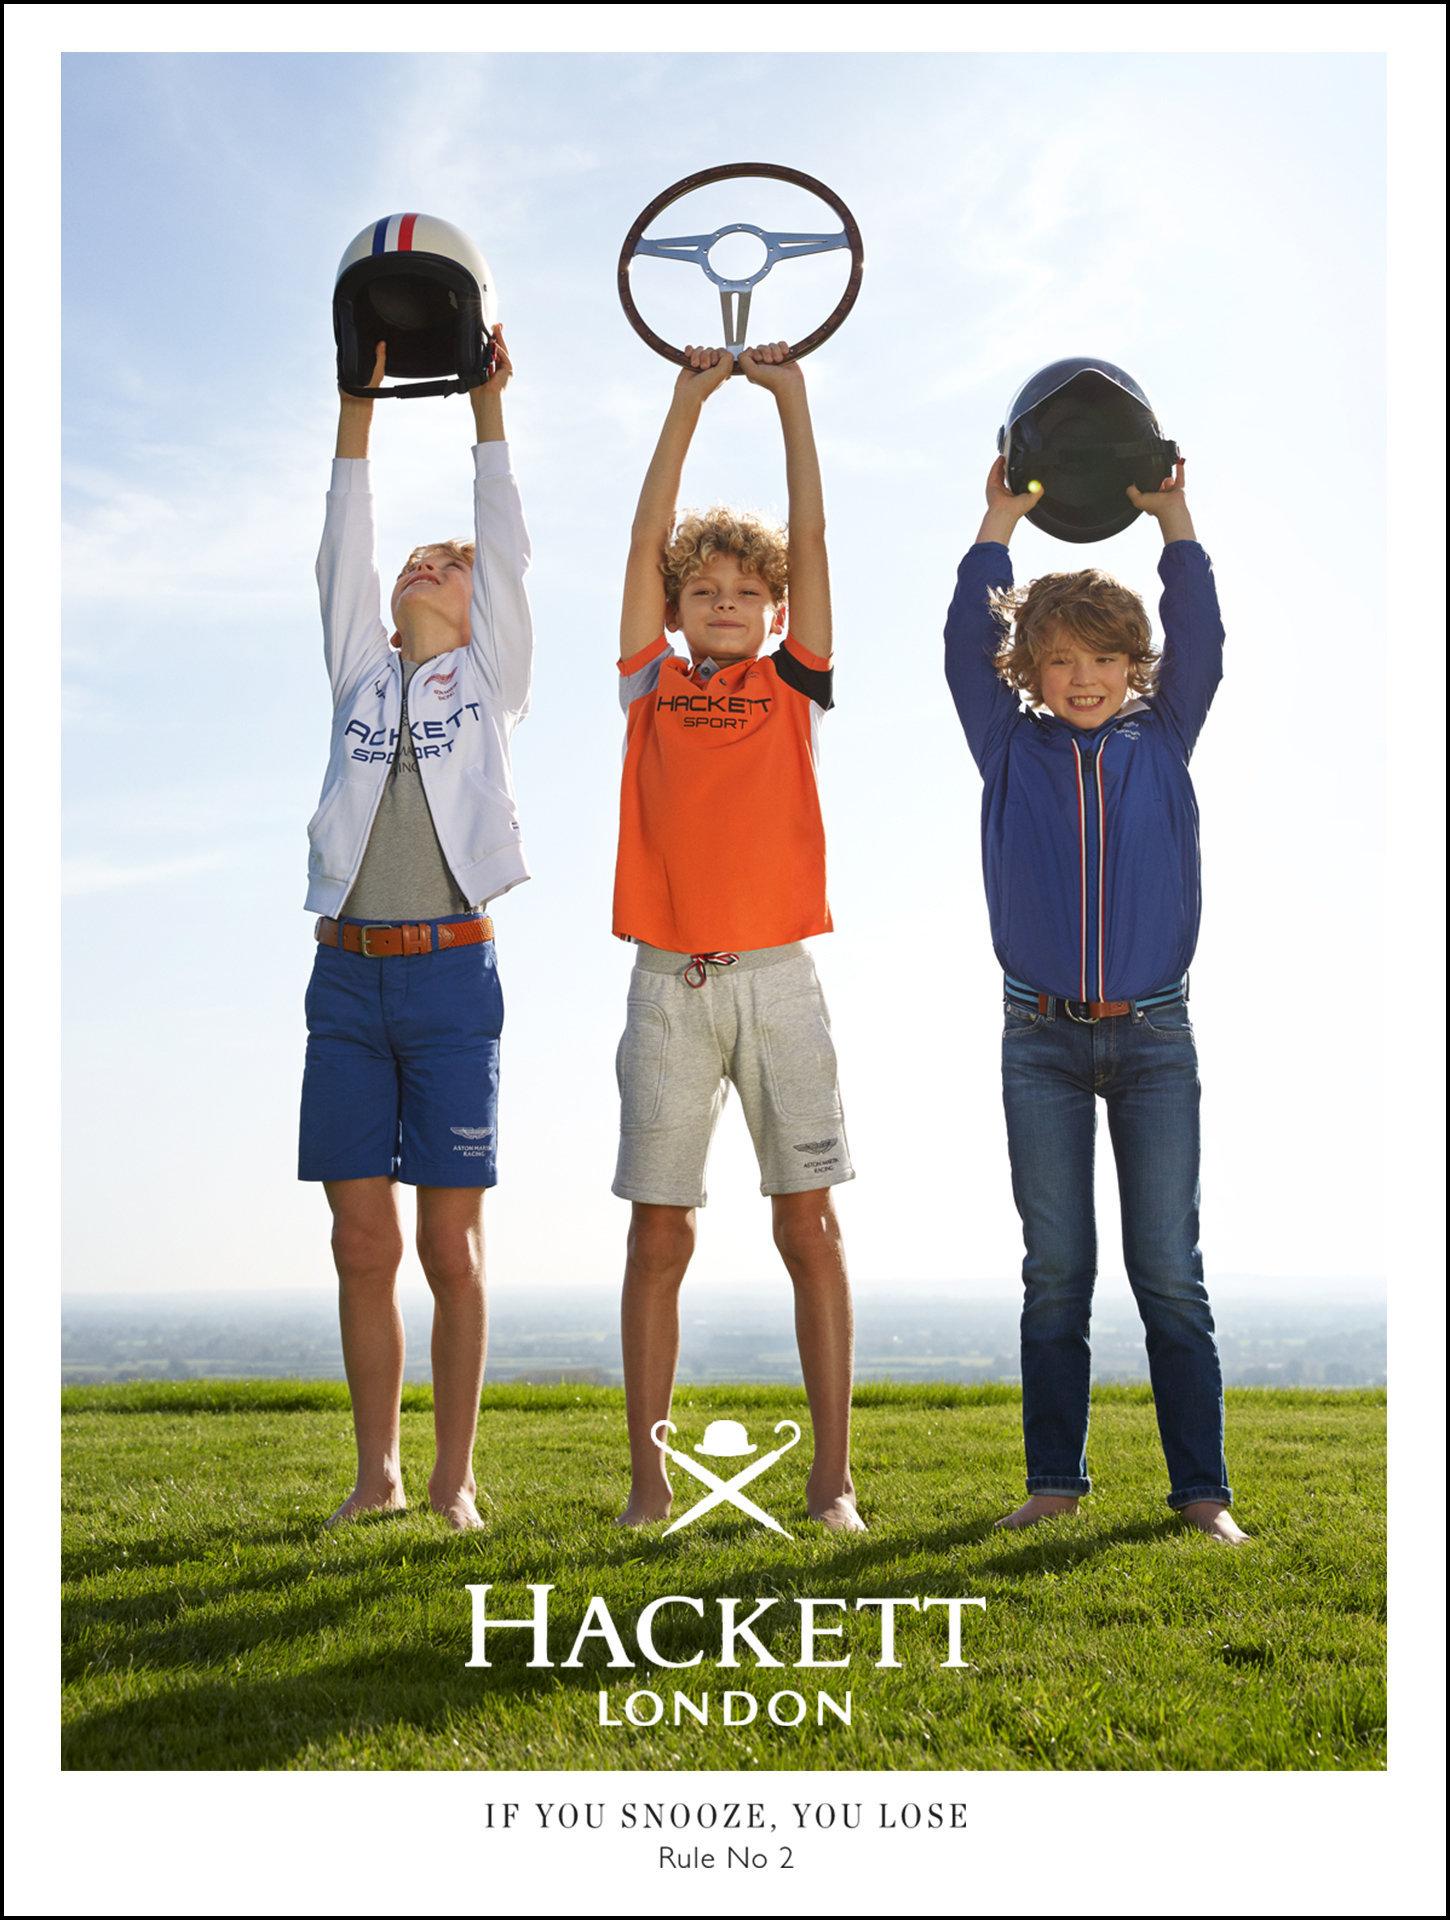 hackett_aw14_rule_b-1.jpg